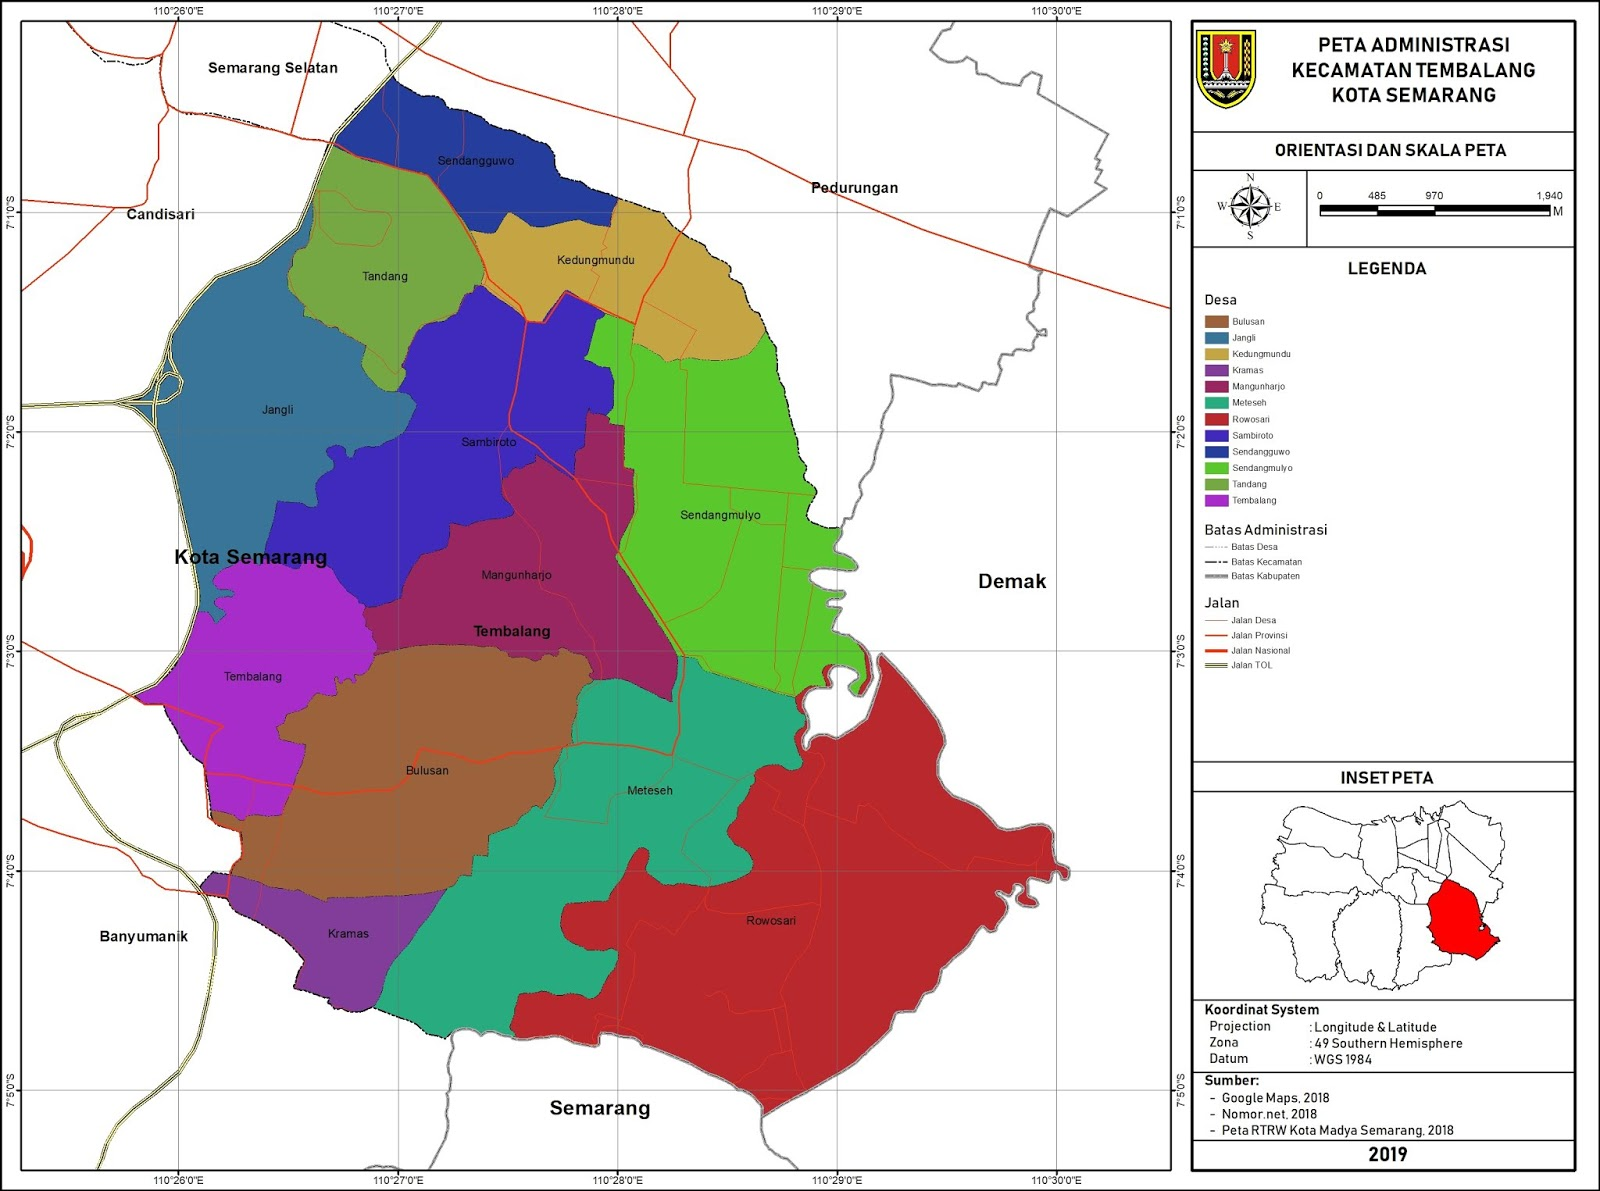 Peta Administrasi Kecamatan Tembalang, Kota Semarang ...